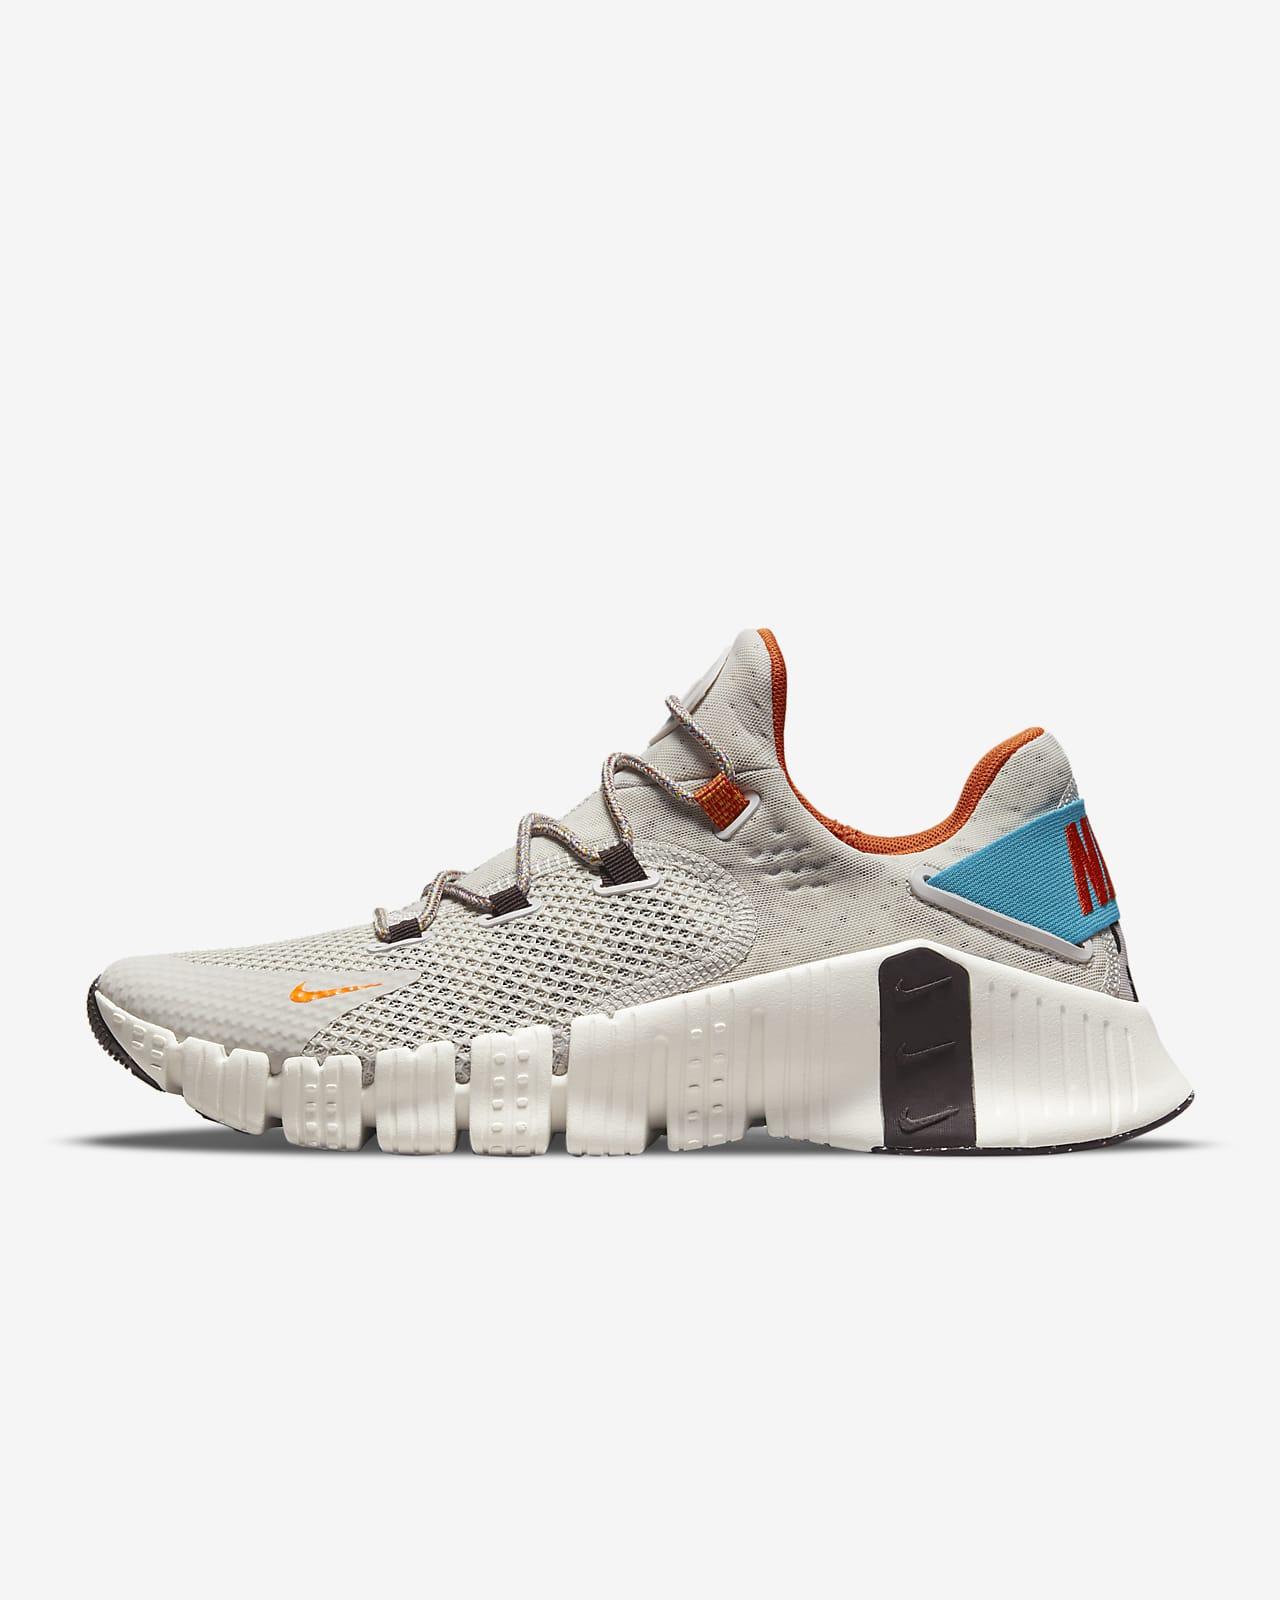 Chaussure de training Nike Free Metcon 4. Nike LU